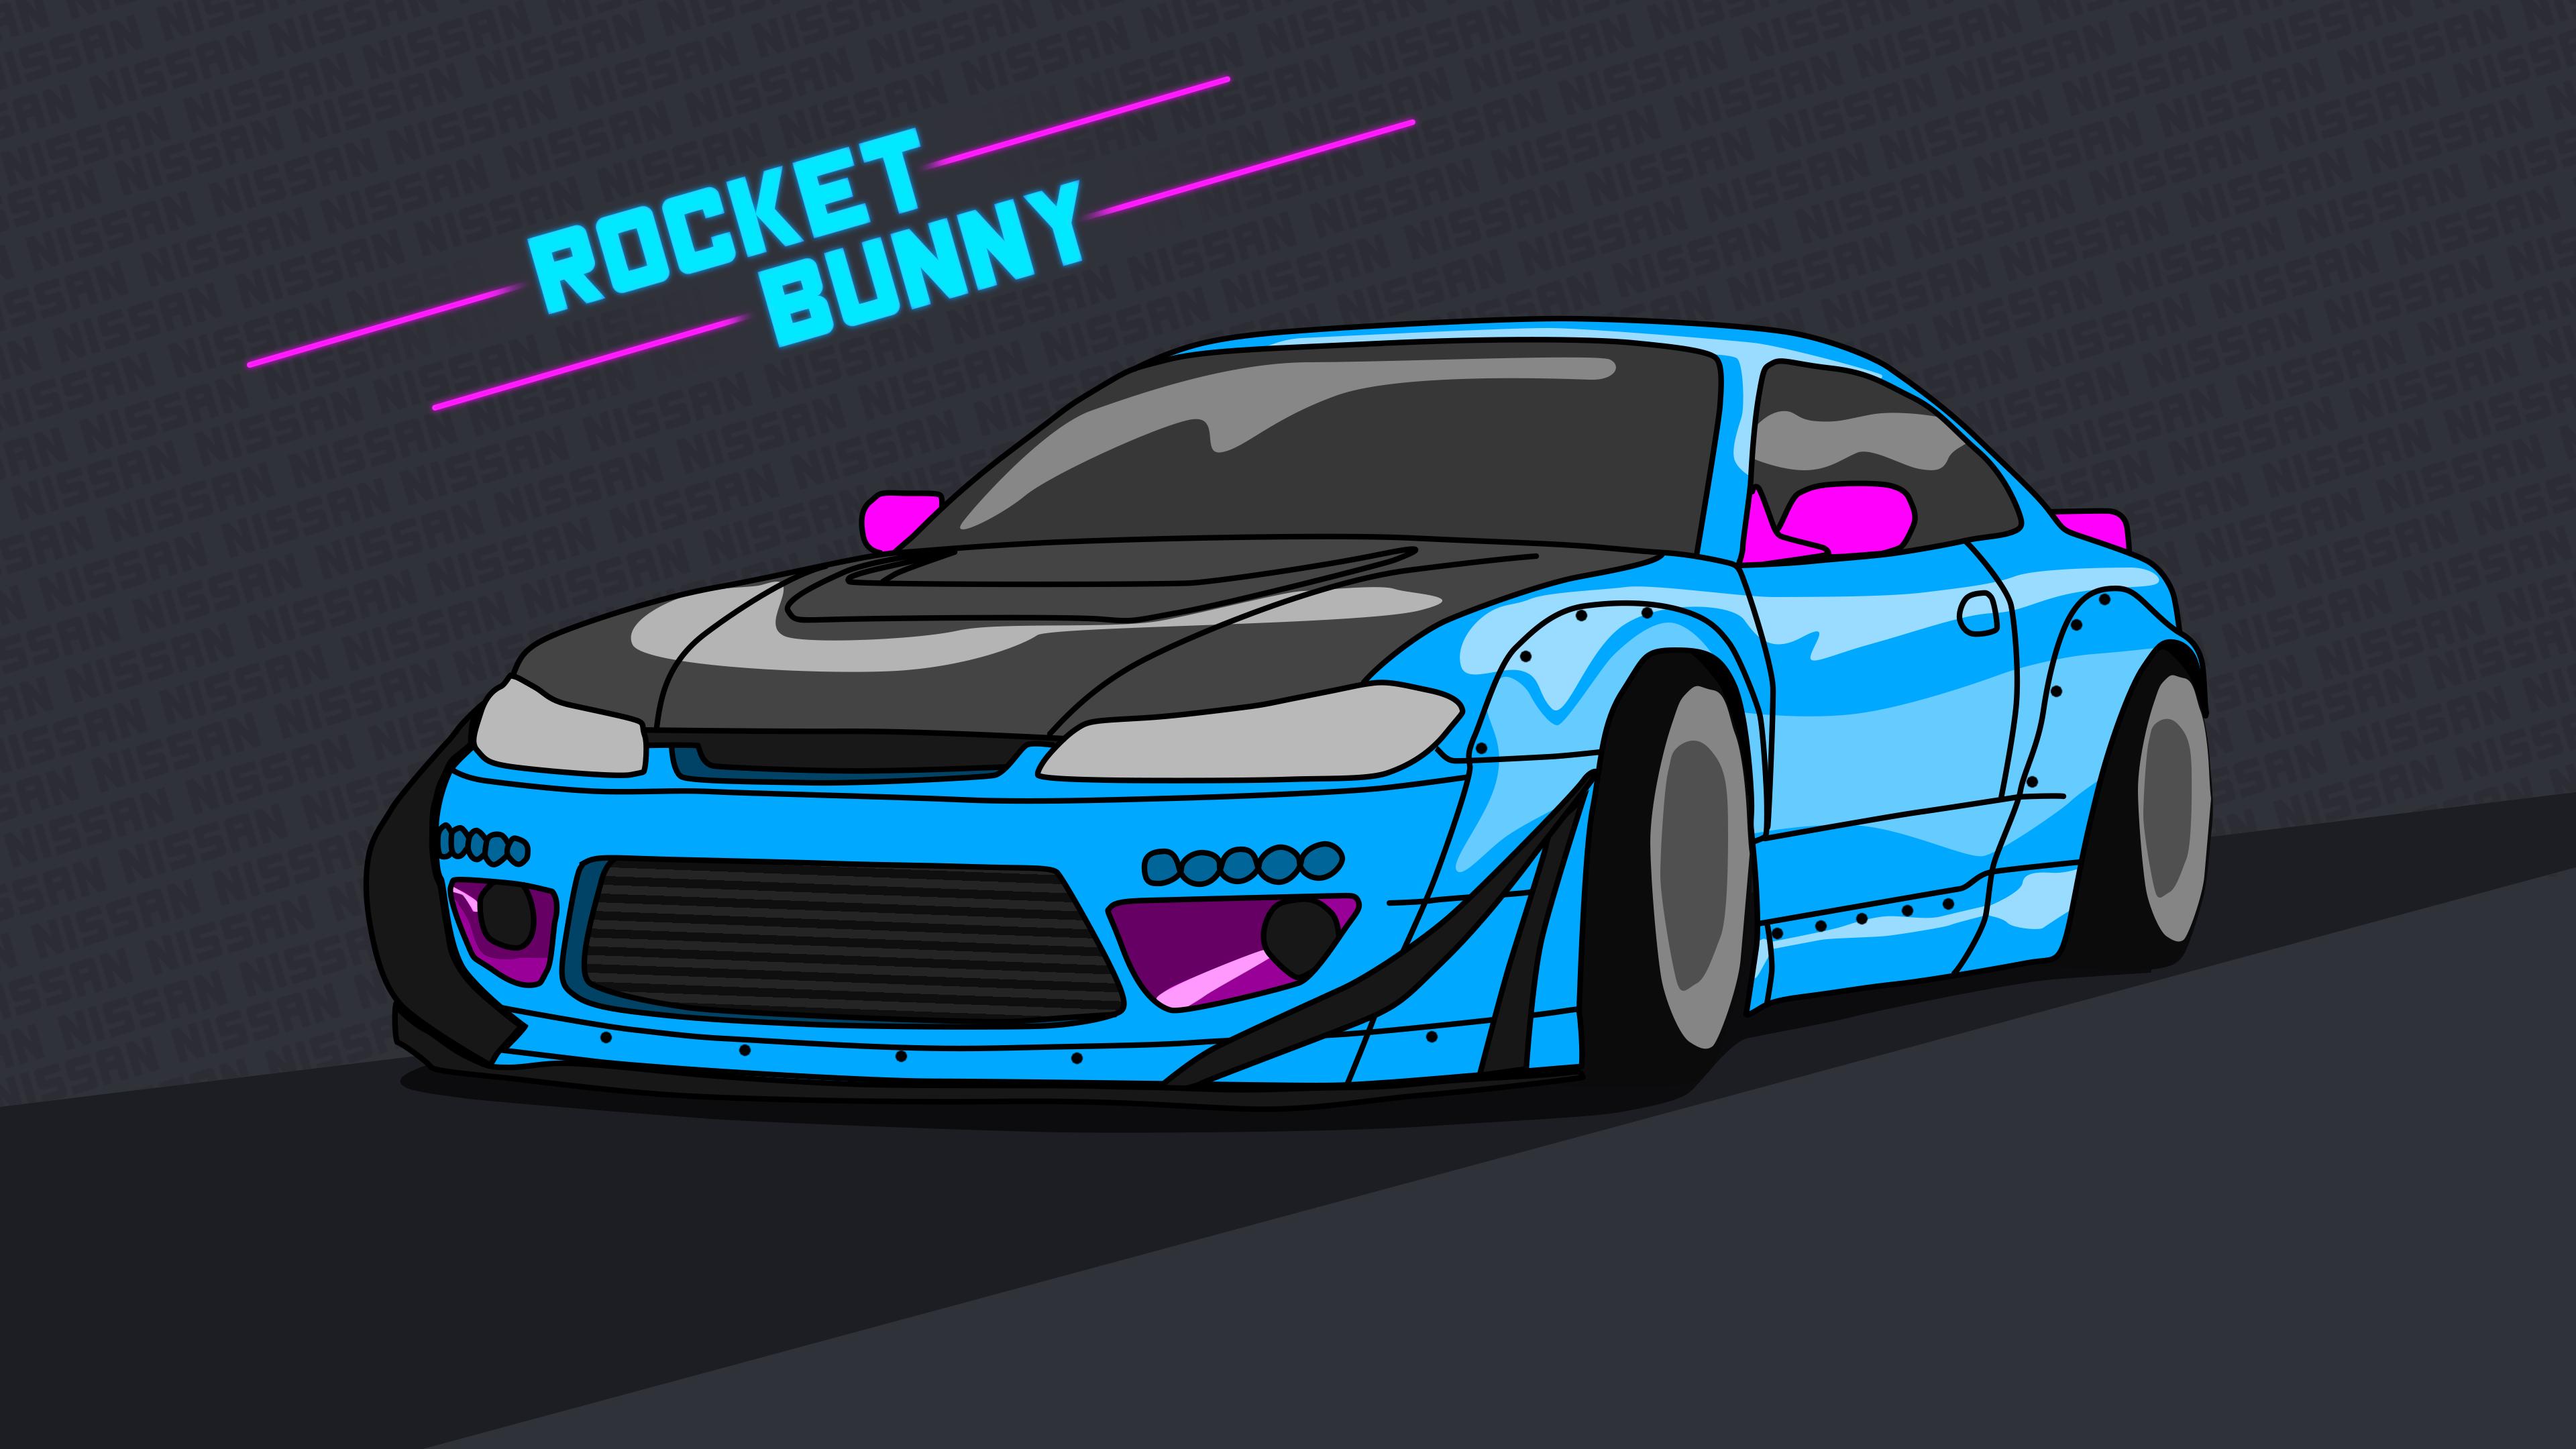 Nissan Silvia S15 Wallpaper 4k Rocket Bunny Neon By